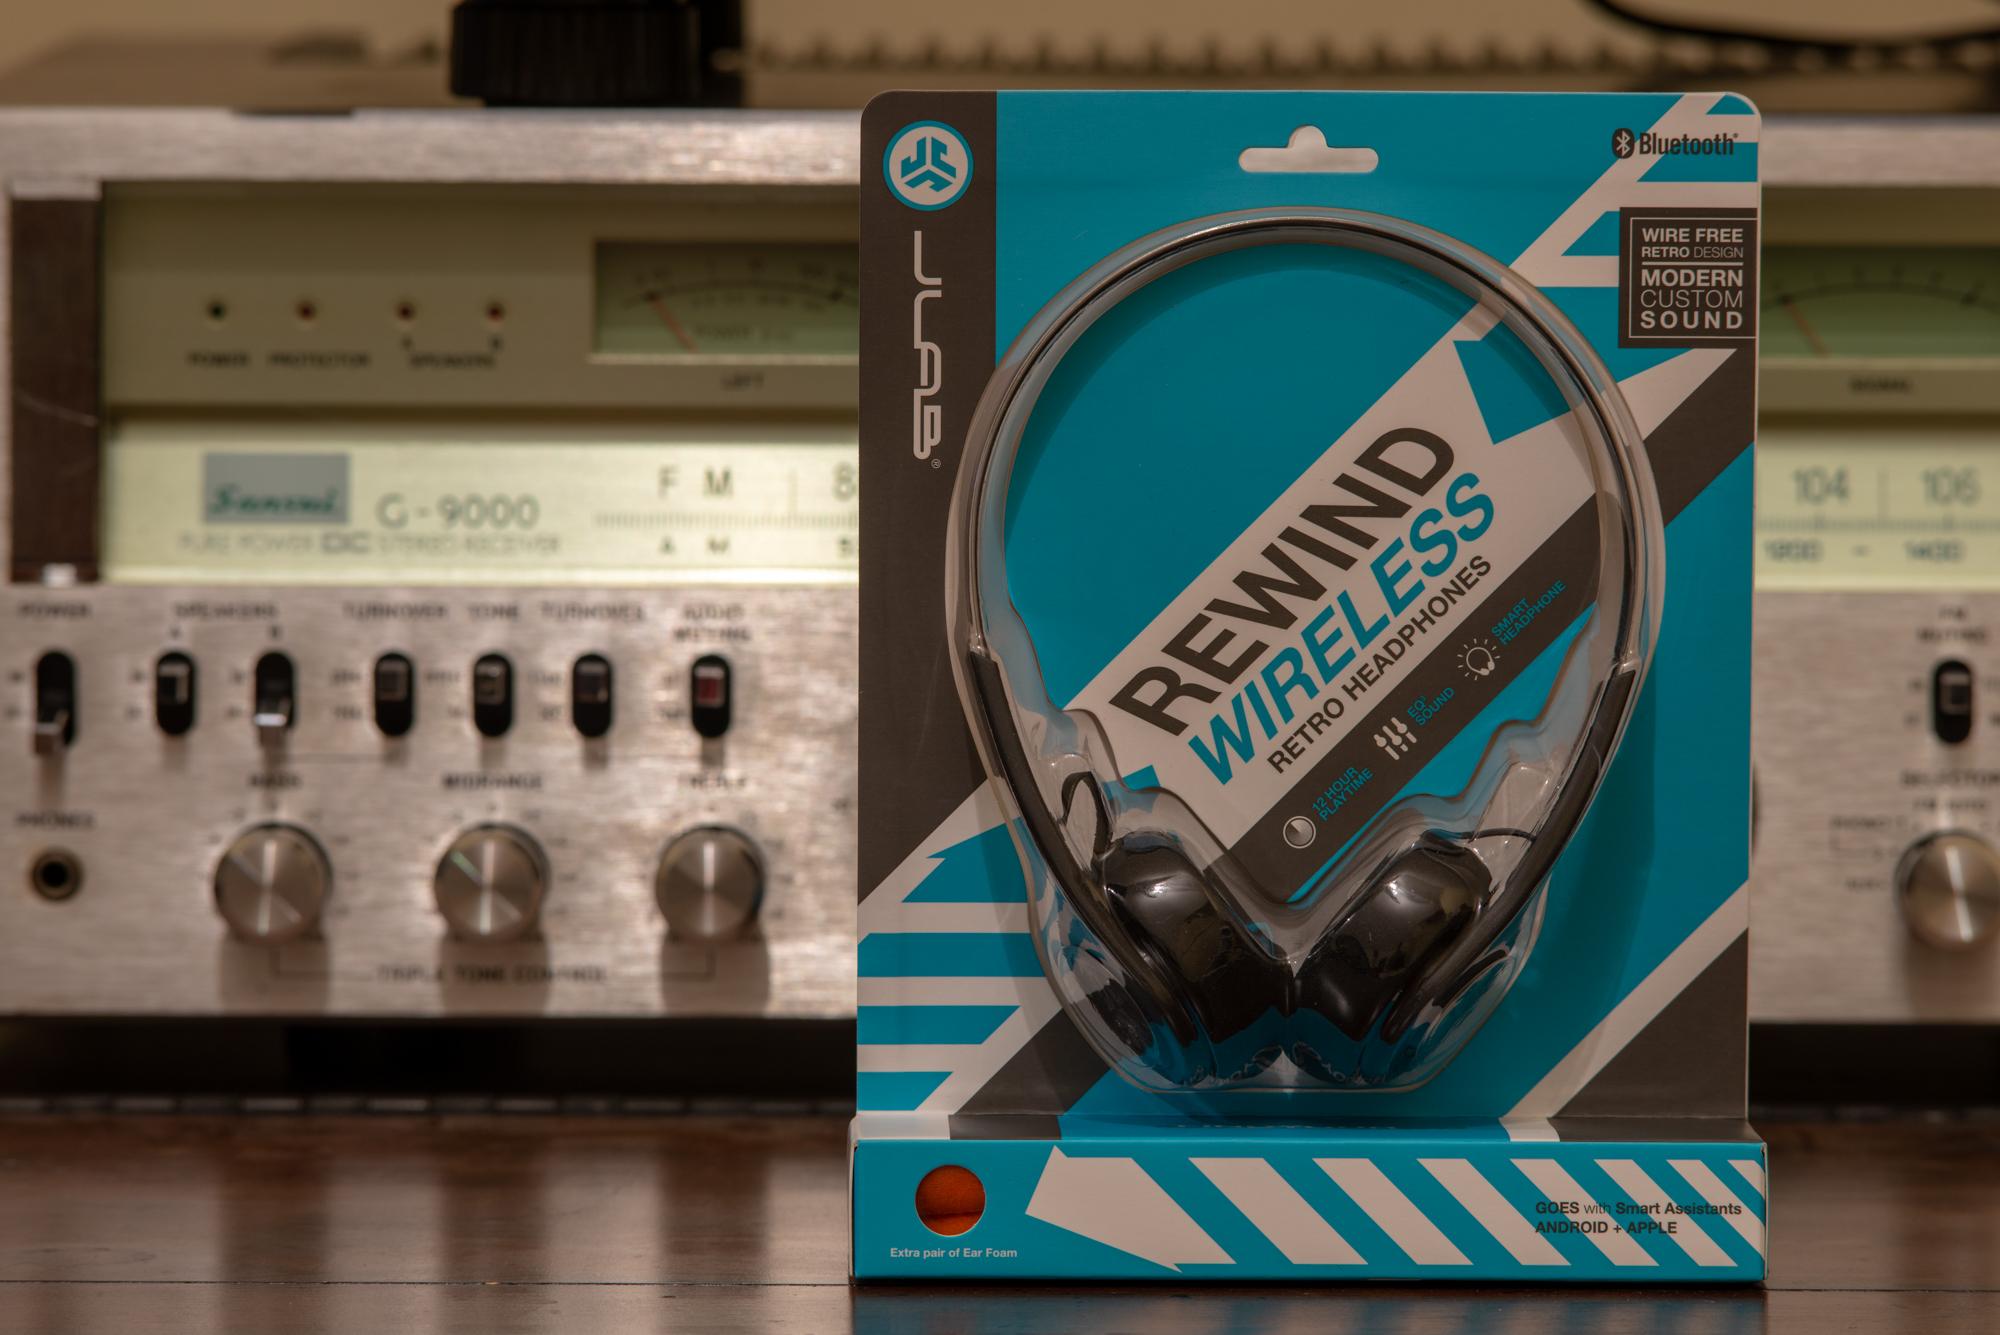 8f4db029583 JLab Audio Rewind Wireless Retro Headphones... | Headphone Reviews ...